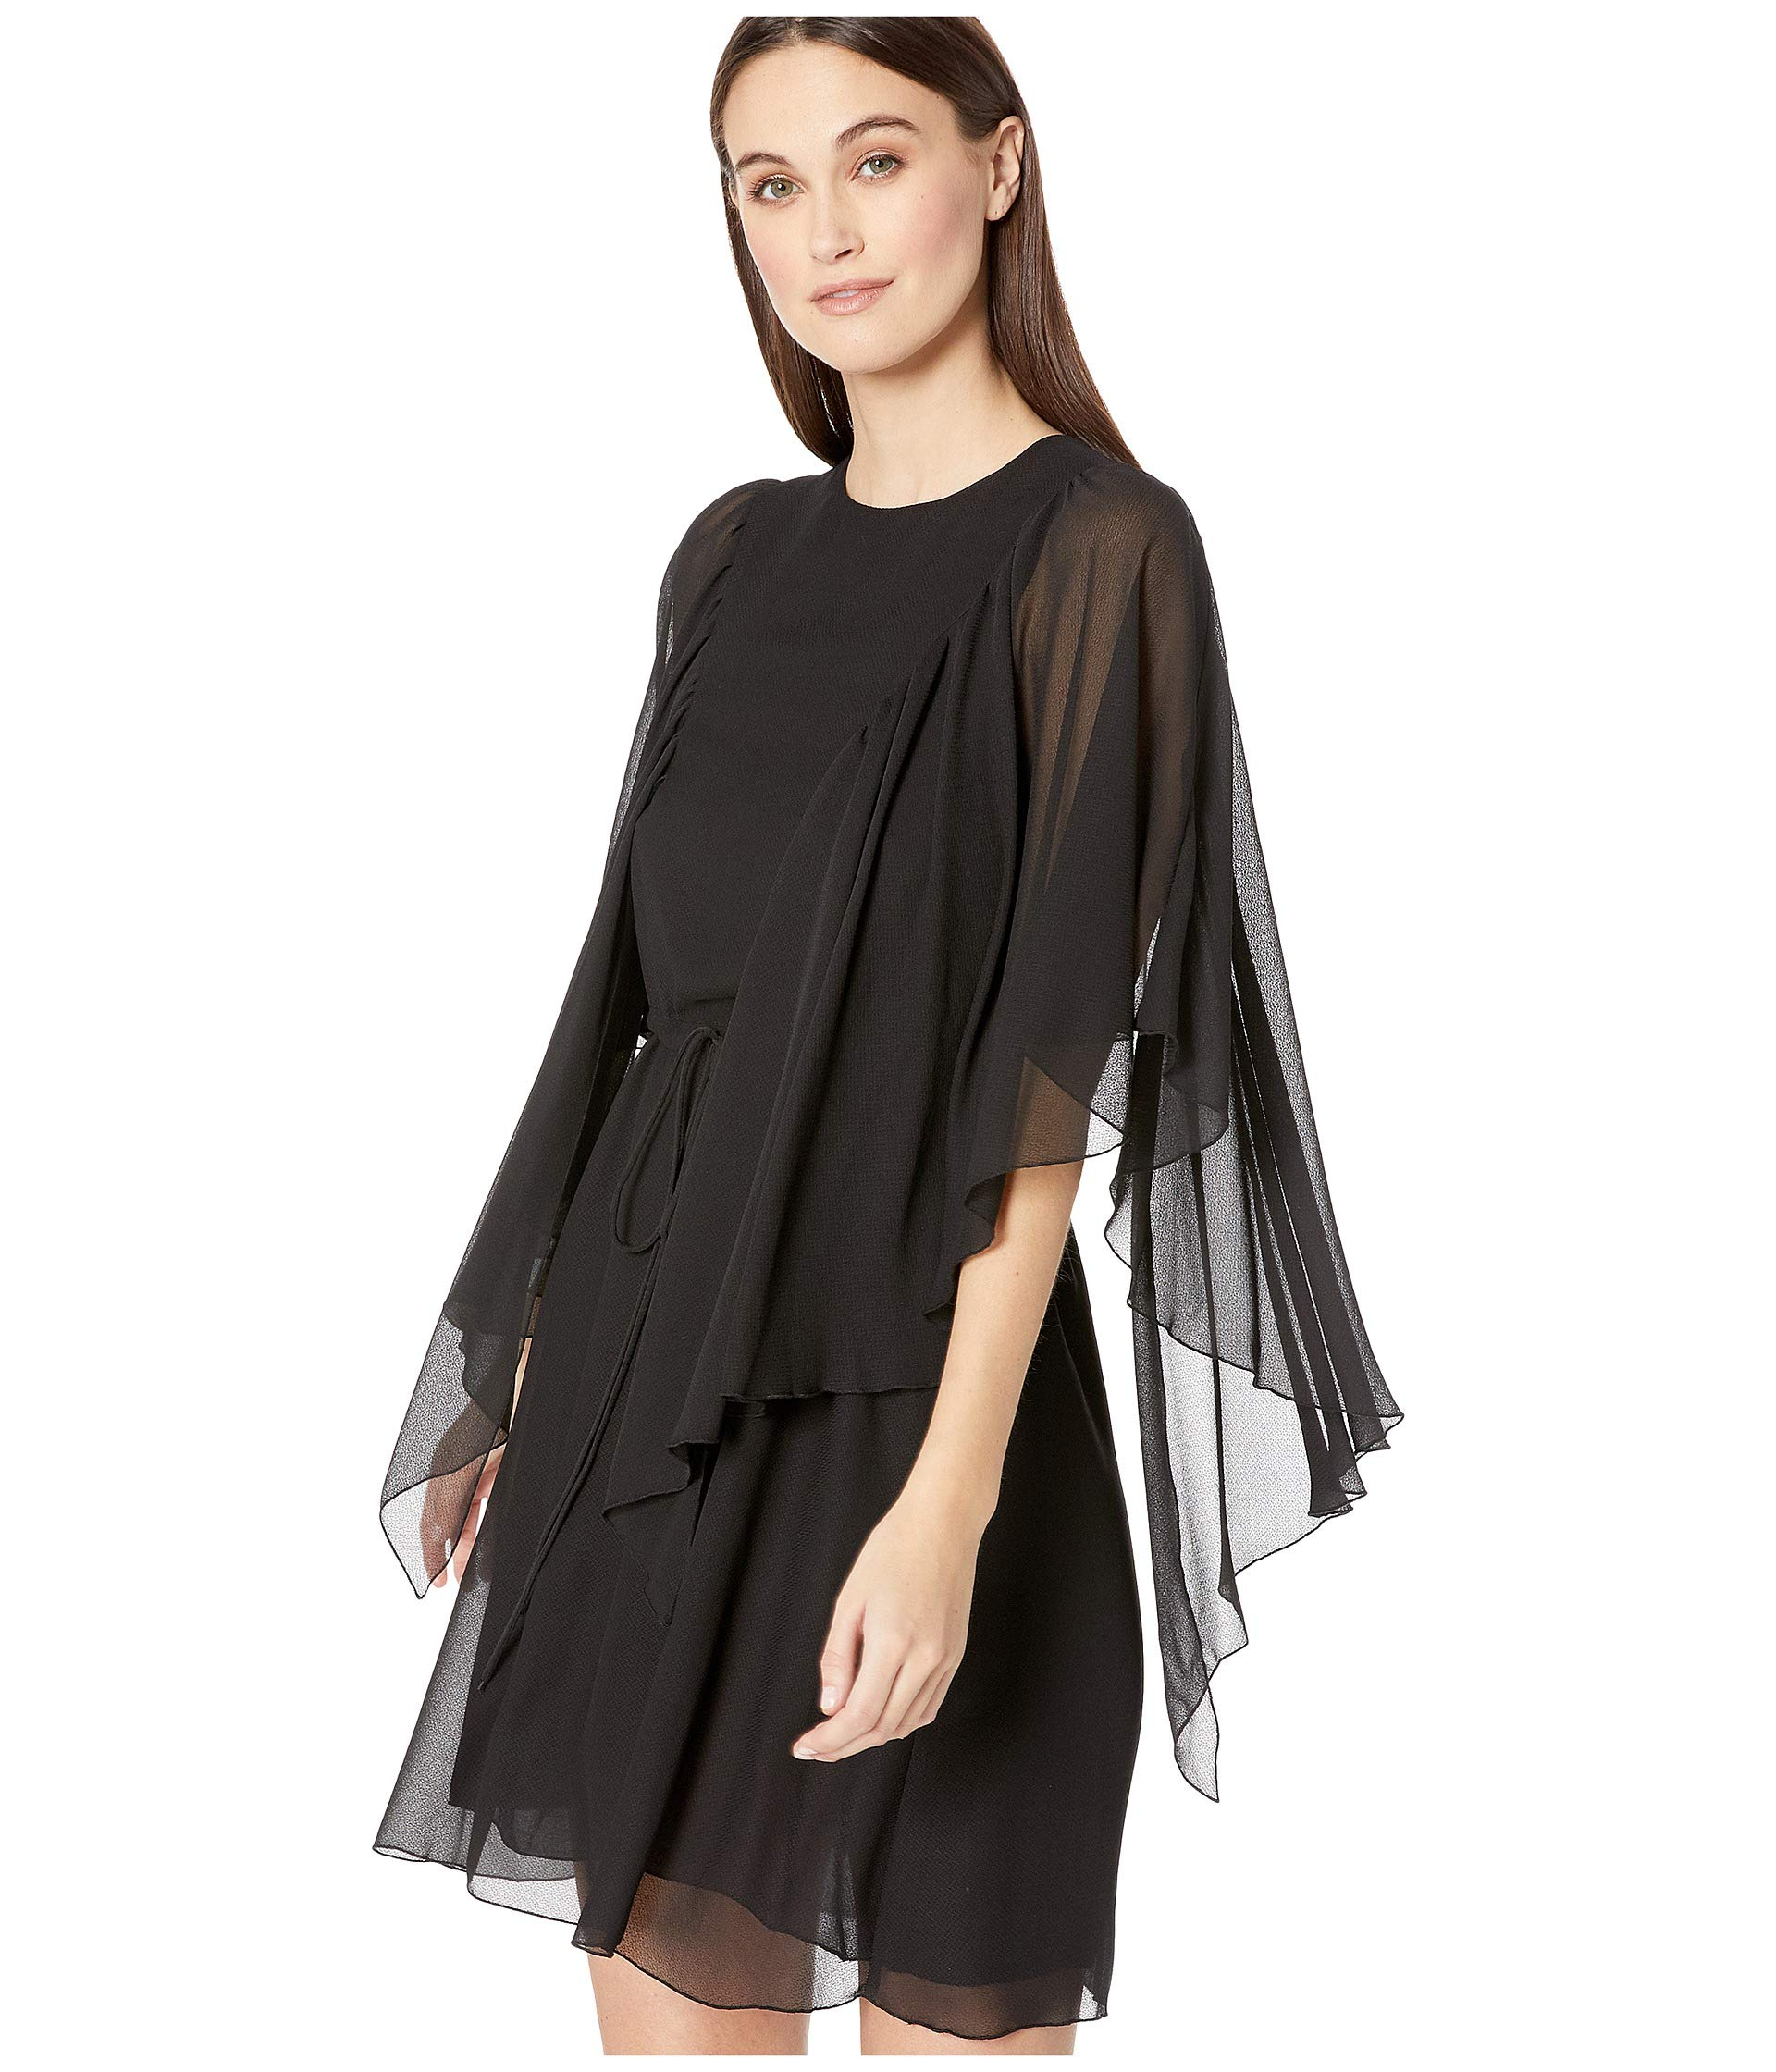 By See Textured Black Flutter Dress Georgette Chloe Sleeve dBxwnr0TBq